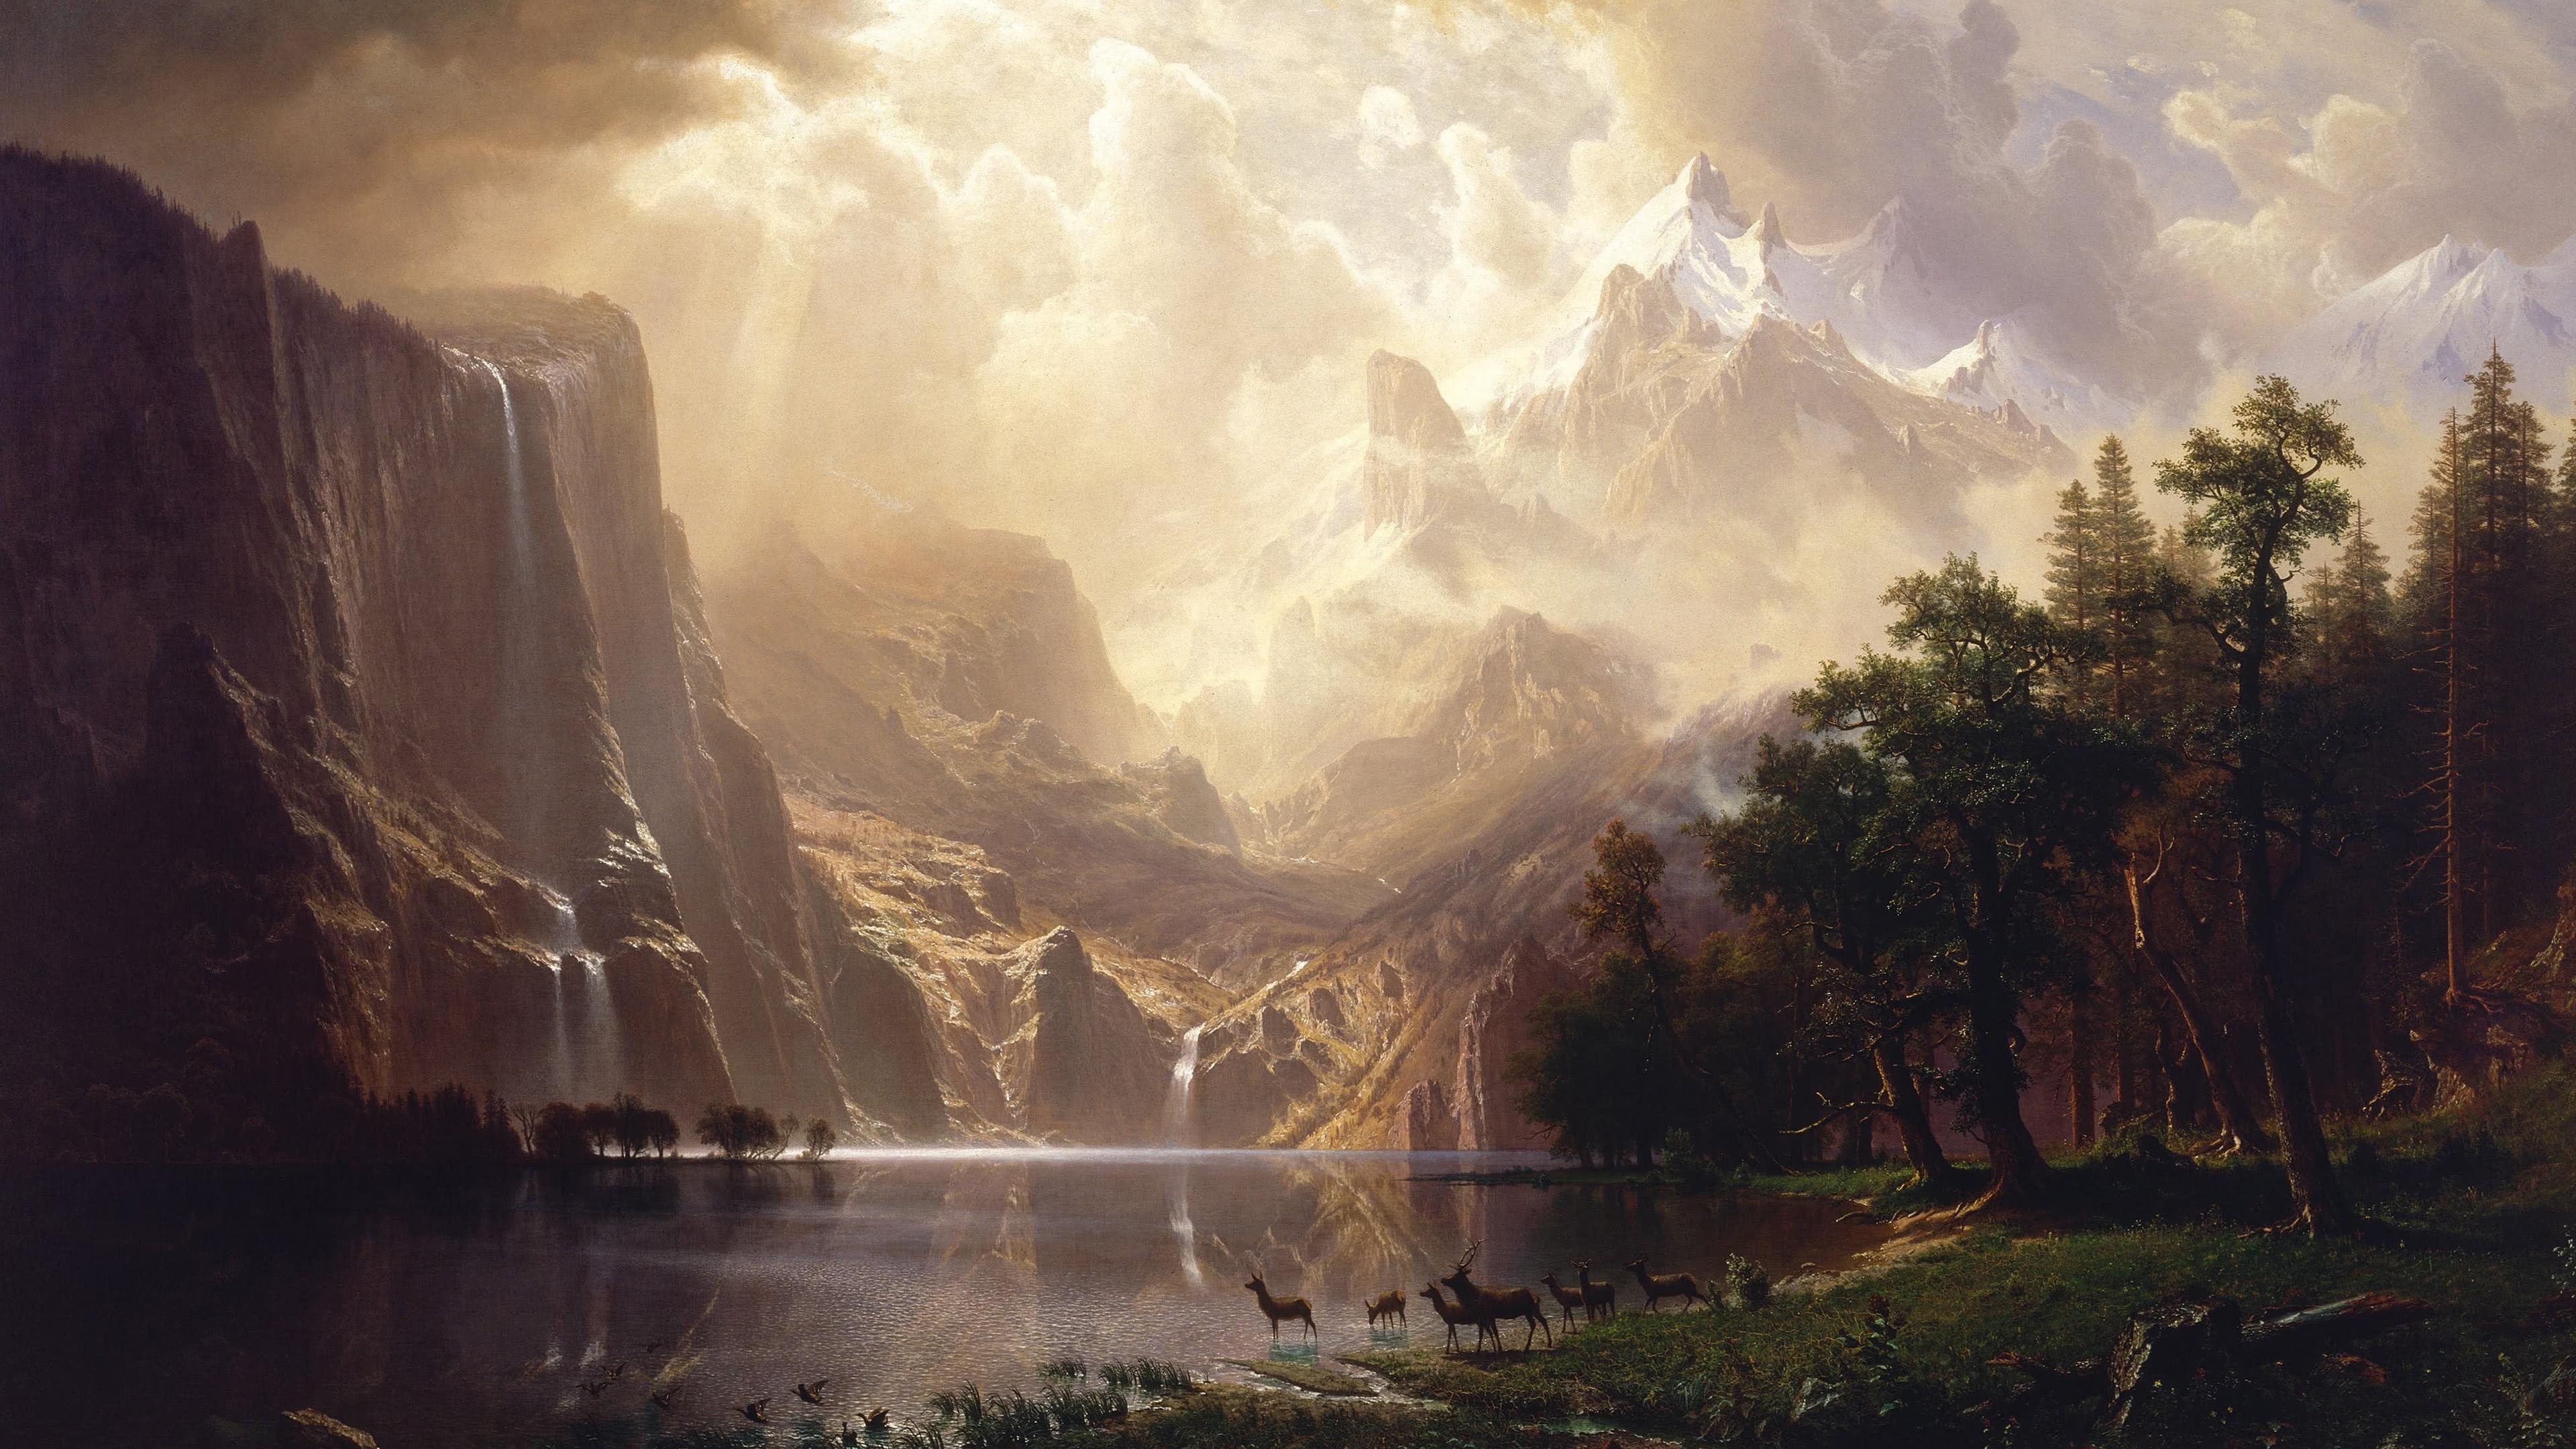 among the sierra nevada mountains california oil painting uhd 4k wallpaper